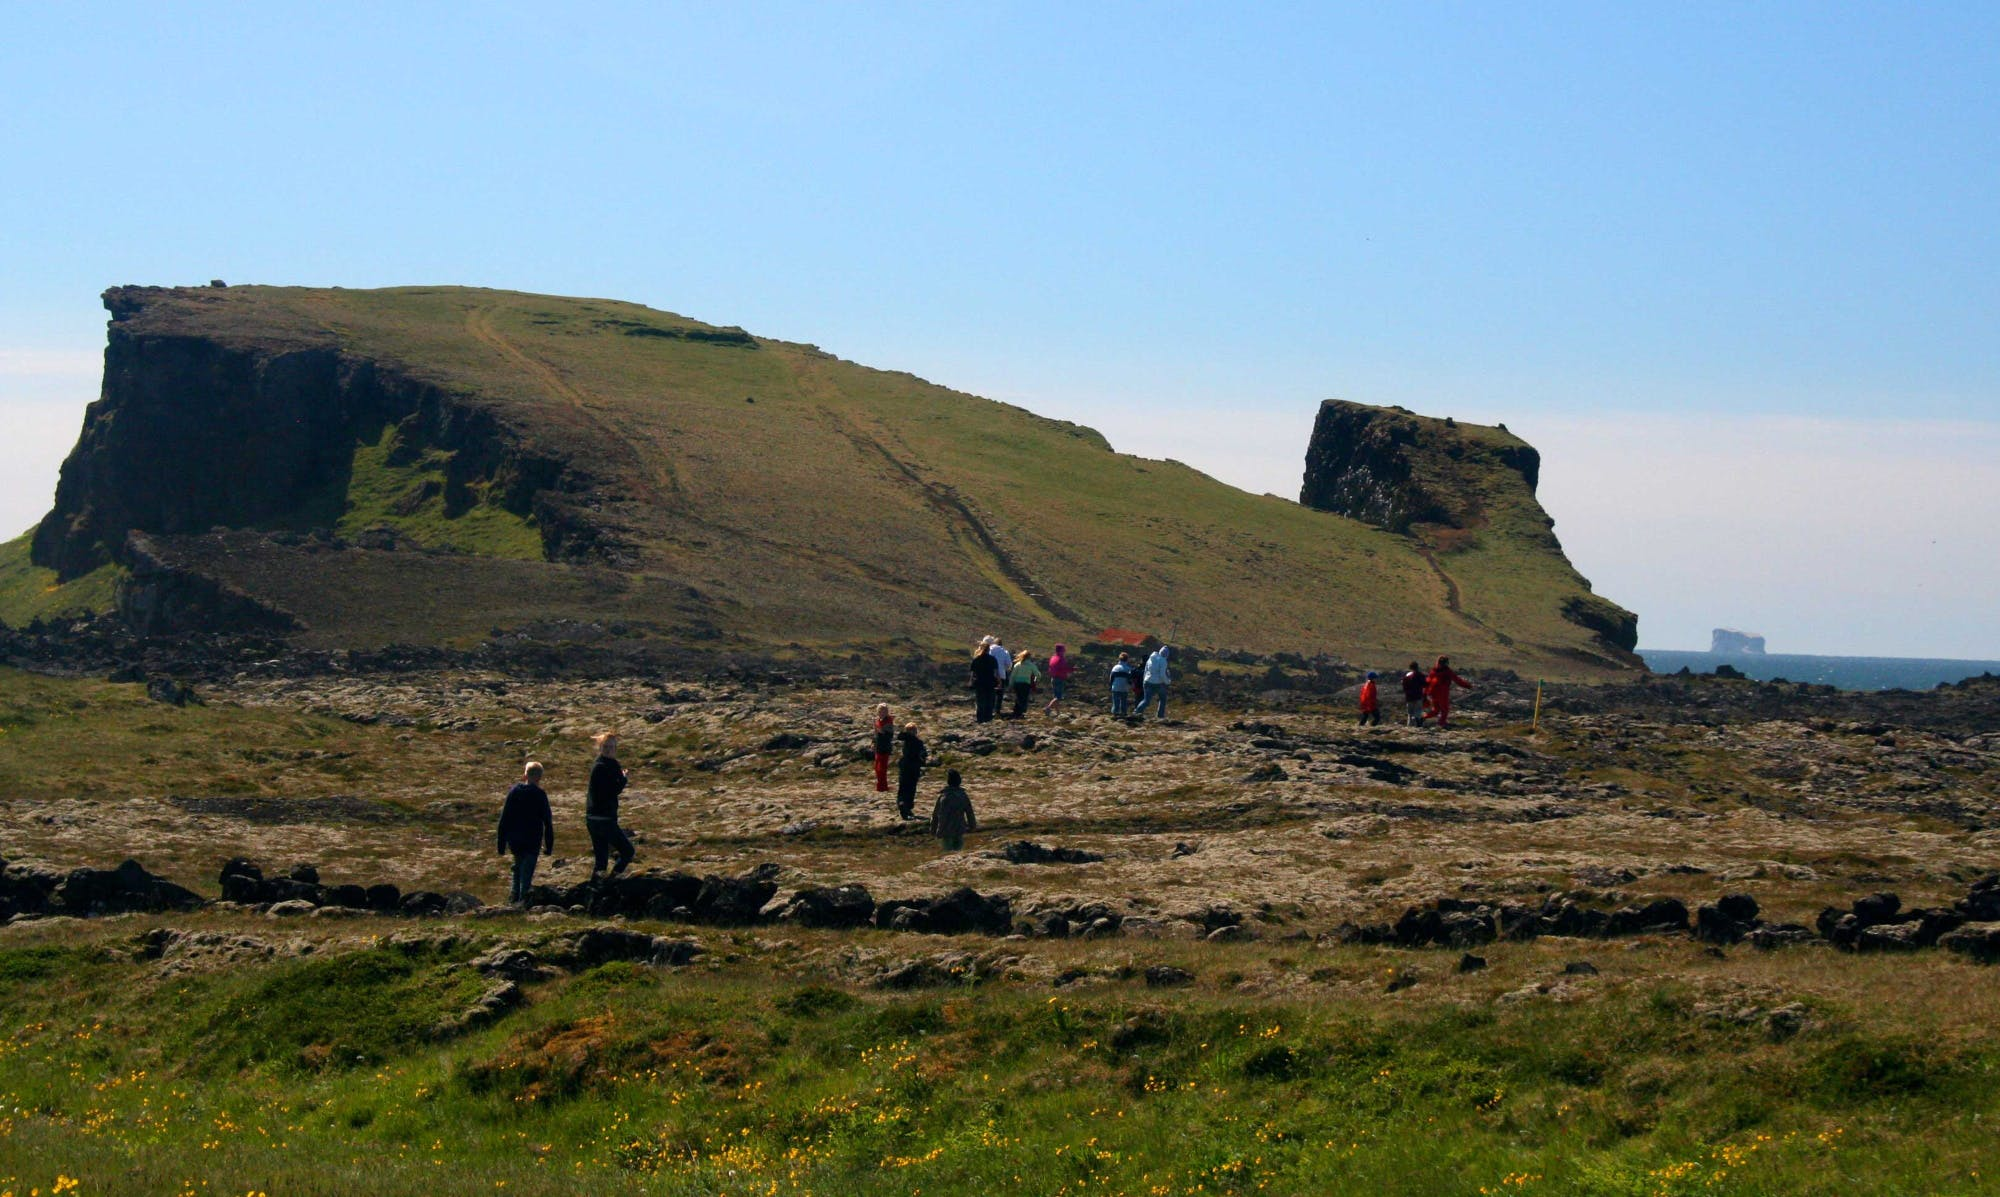 People hiking on Reykjanes peninsula